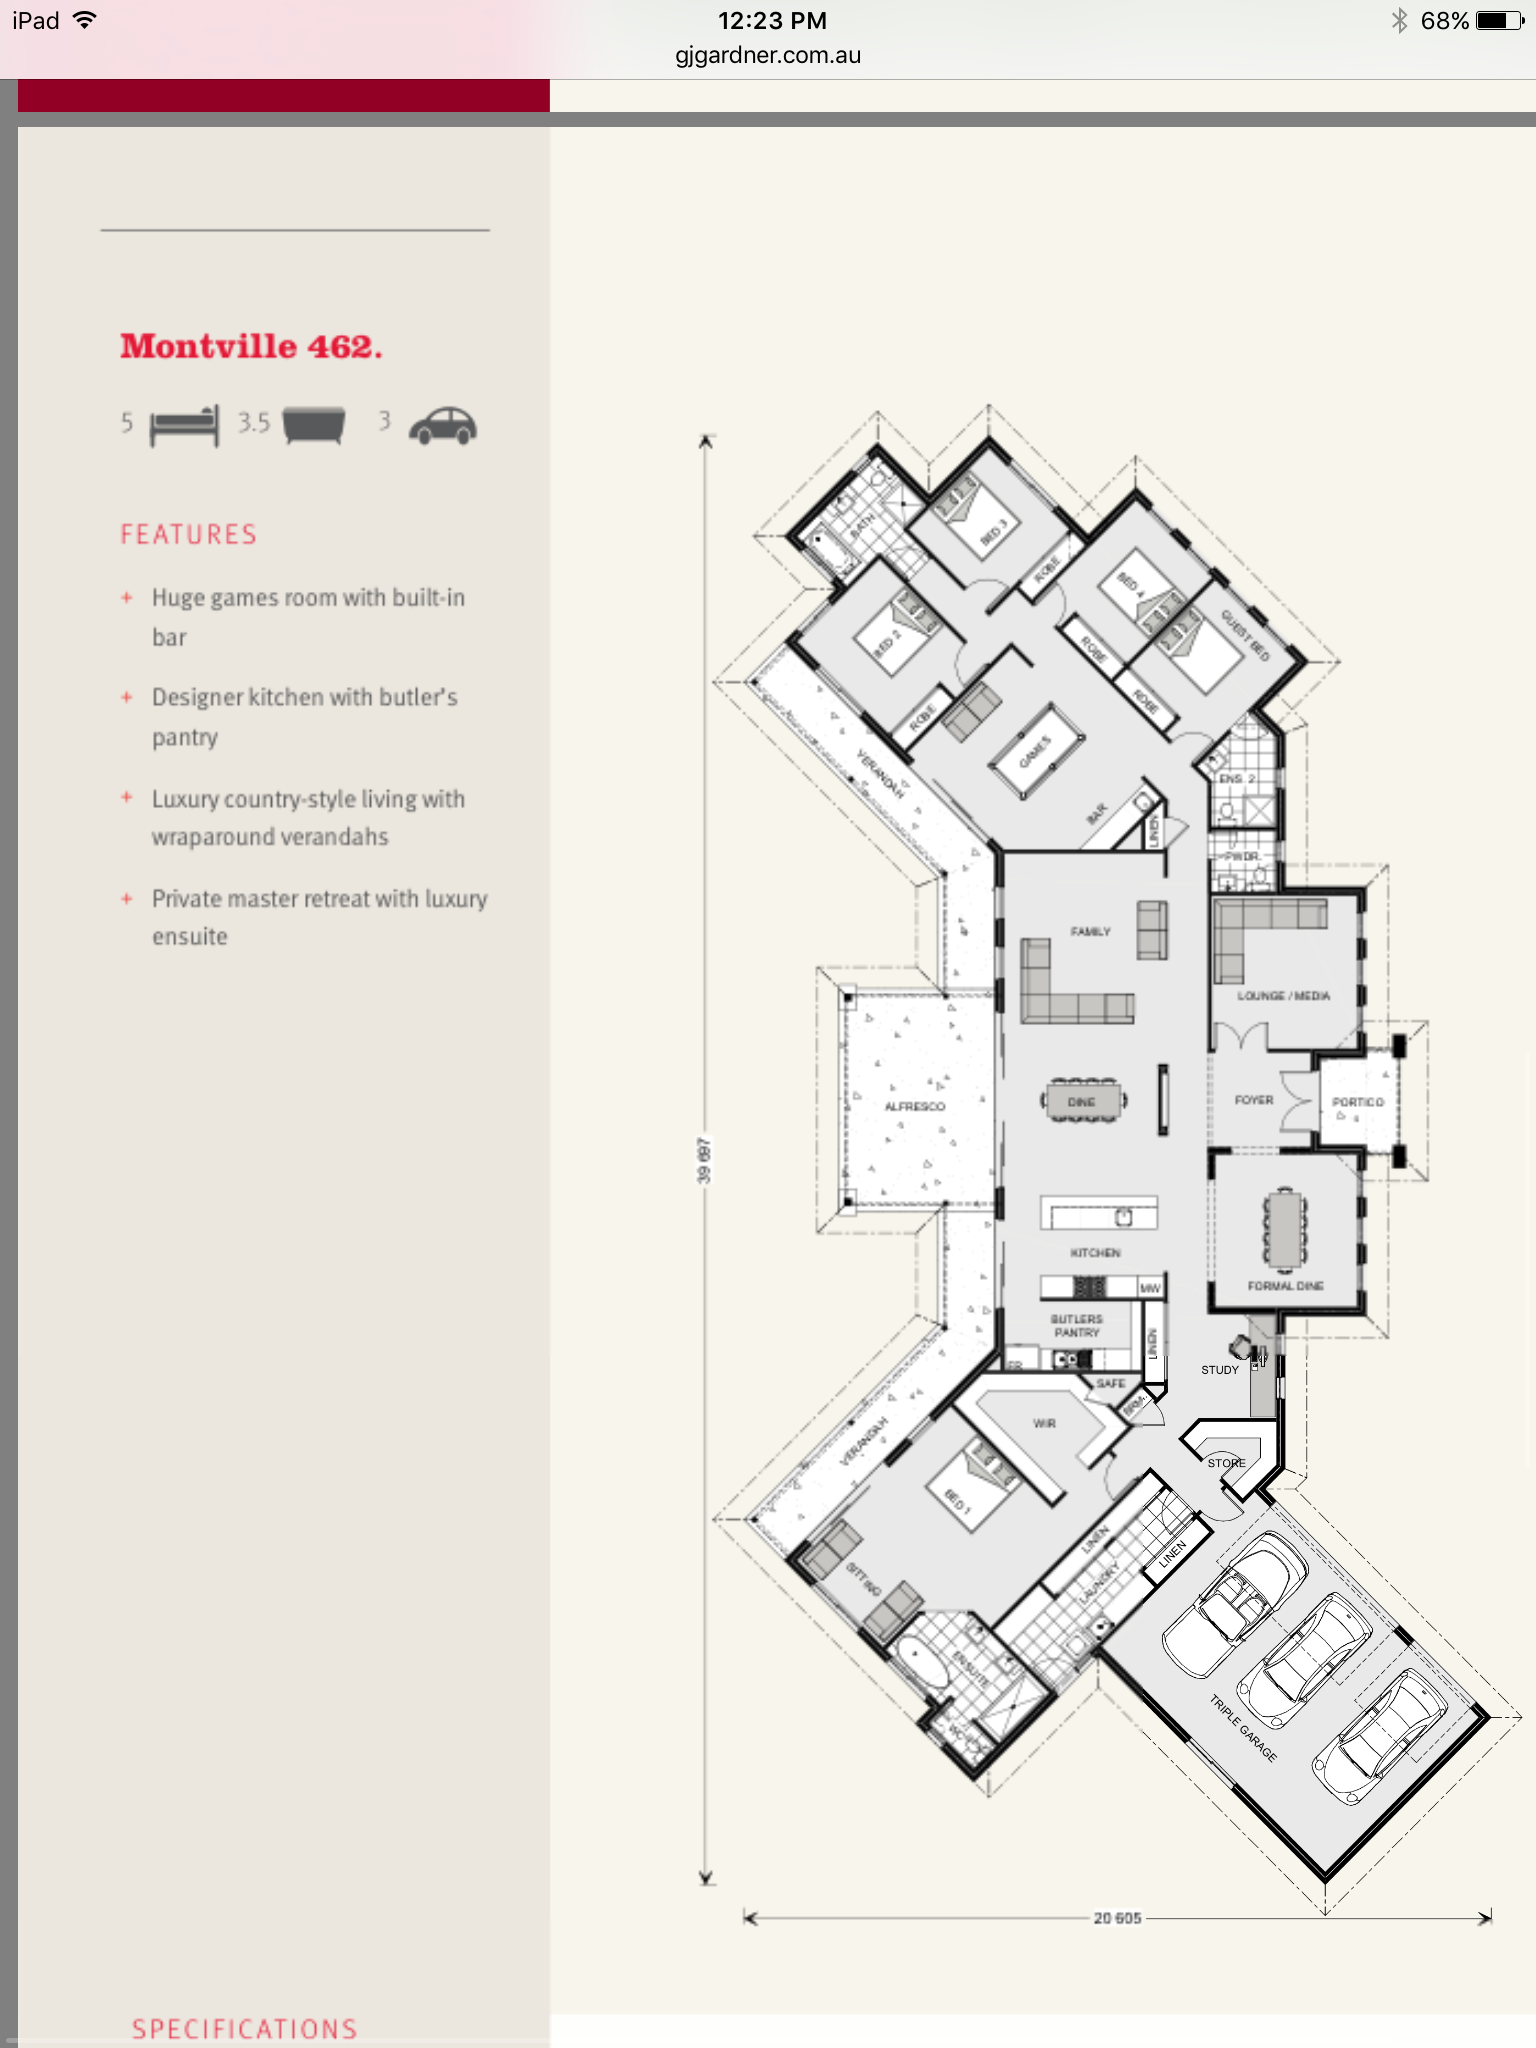 Dream House Plans Home Design Floor Plans Dream House Plans U Shaped House Plans